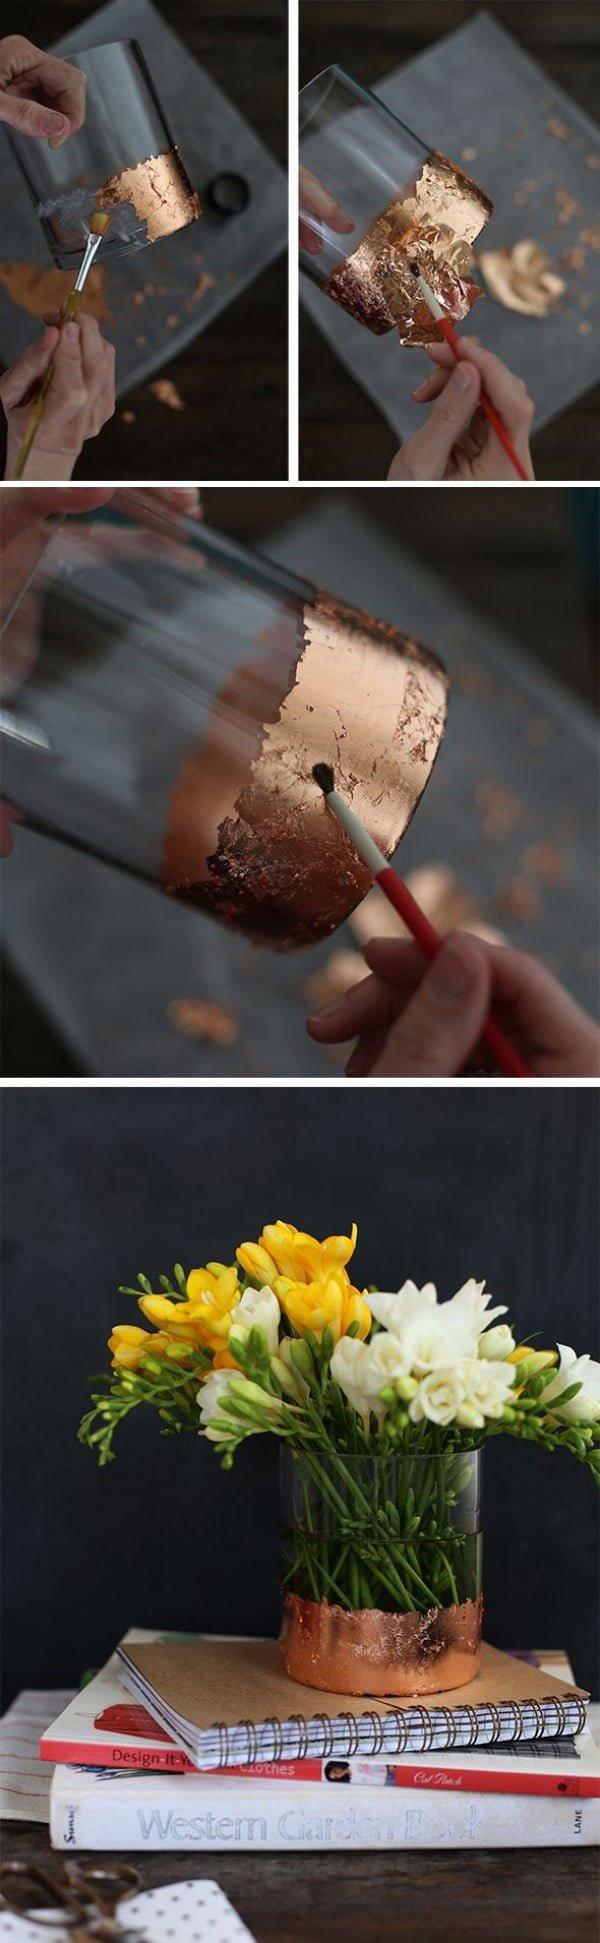 Check out how to make a DIY gold leaf vase